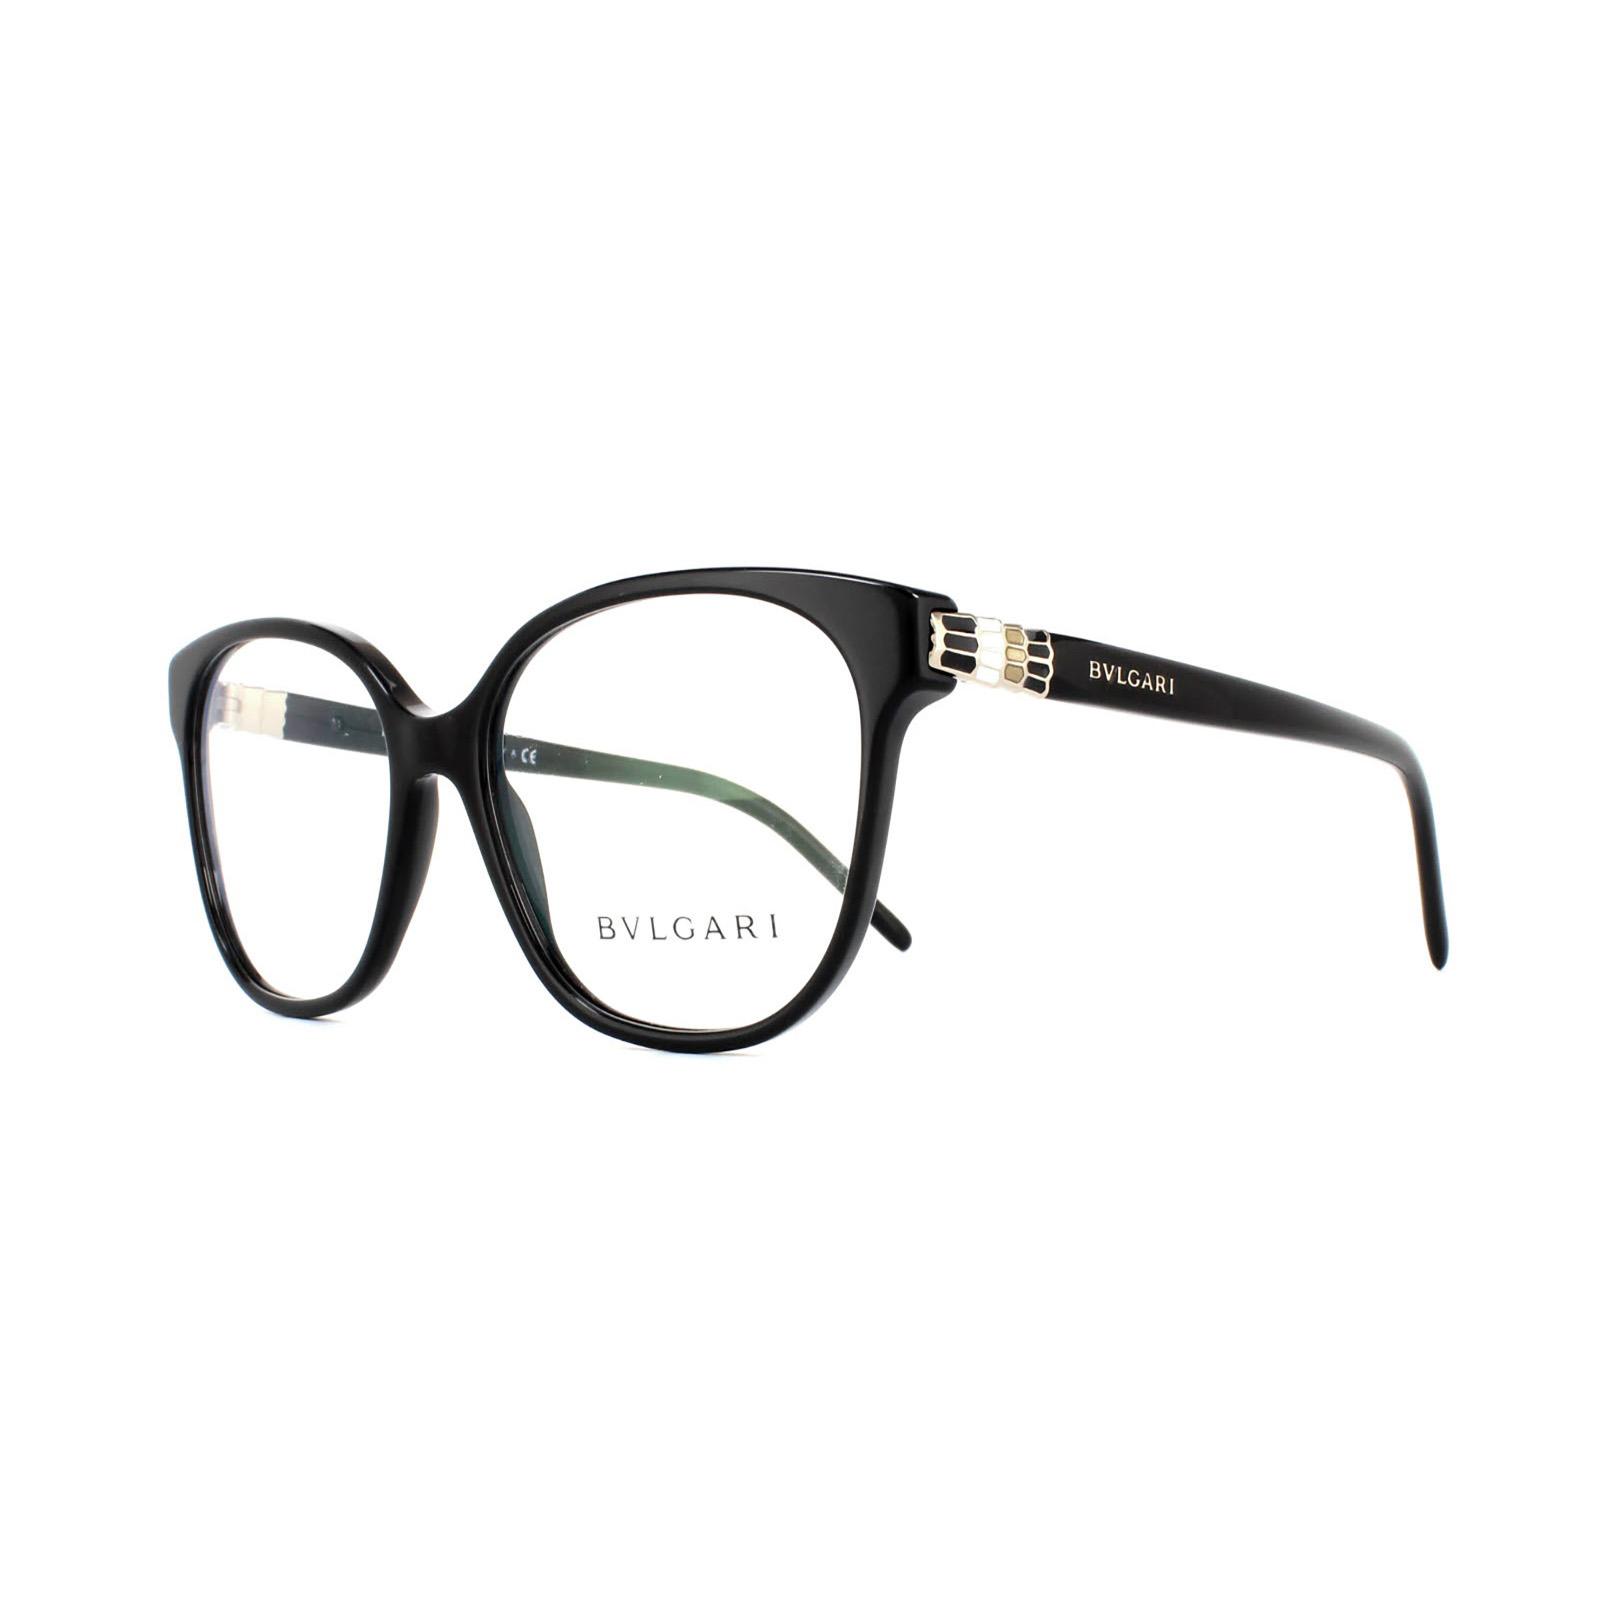 cheap bvlgari 4105 glasses frames discounted sunglasses